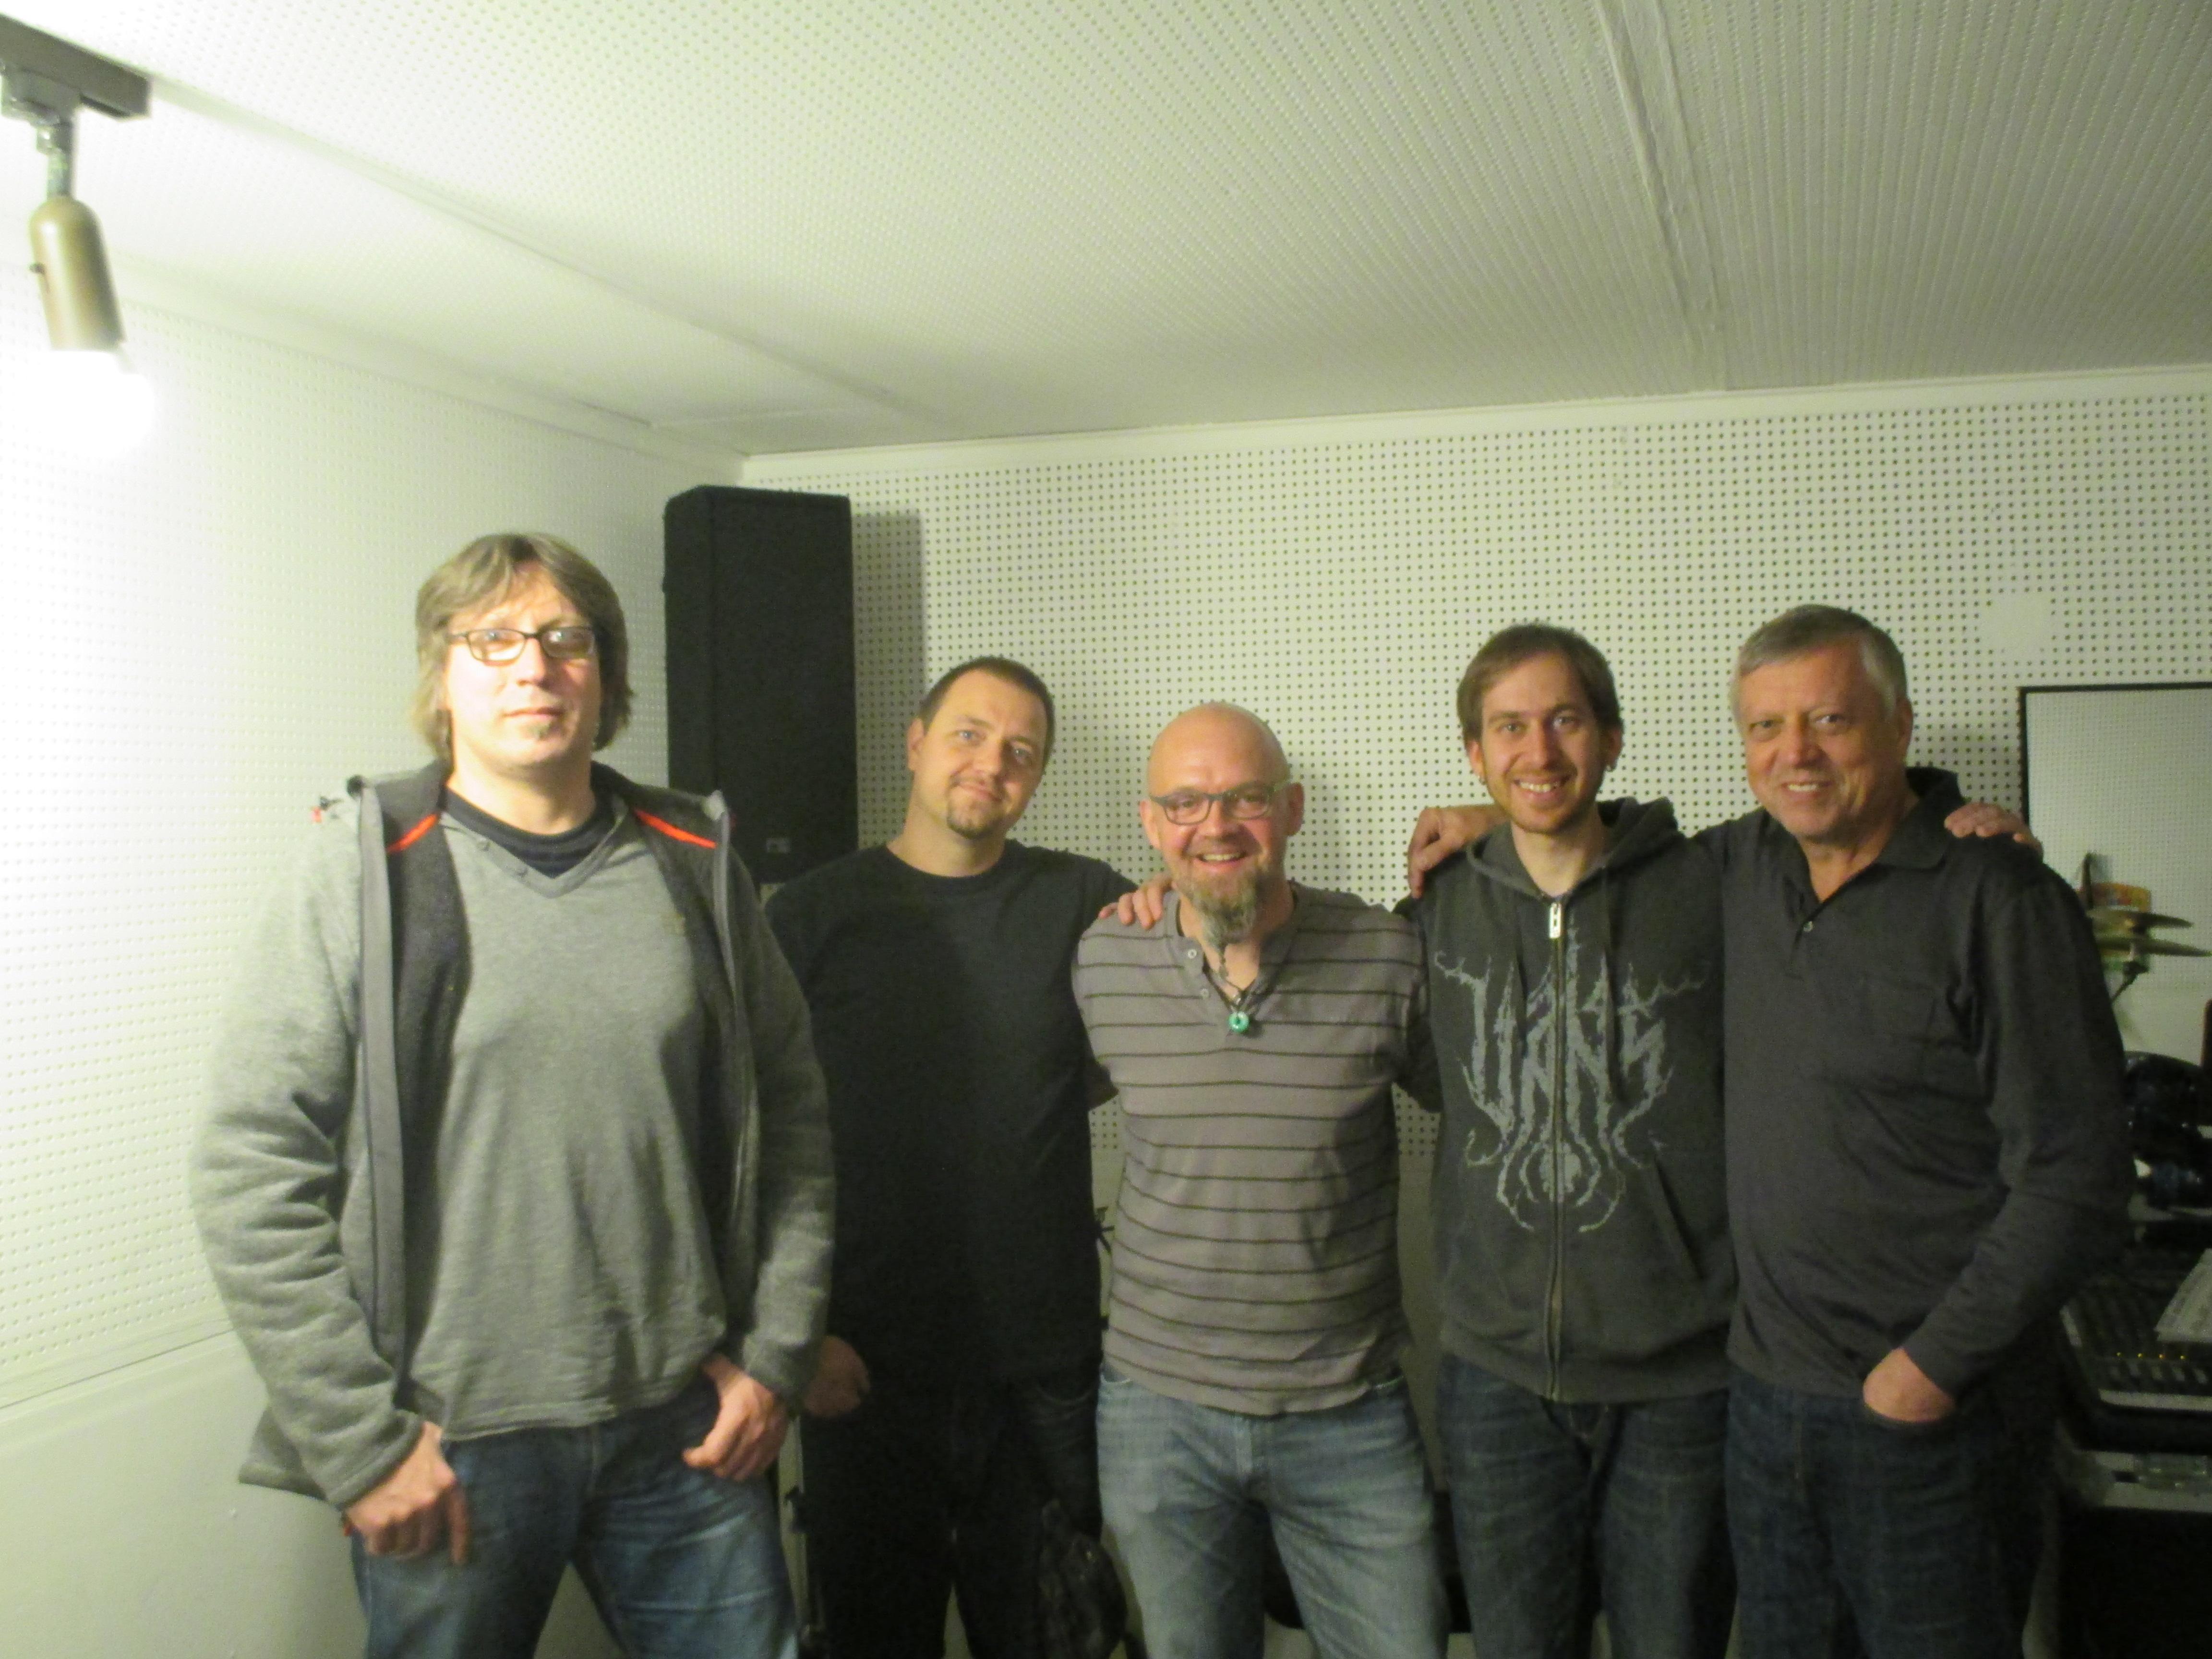 Claus Hessler bei DRUMS